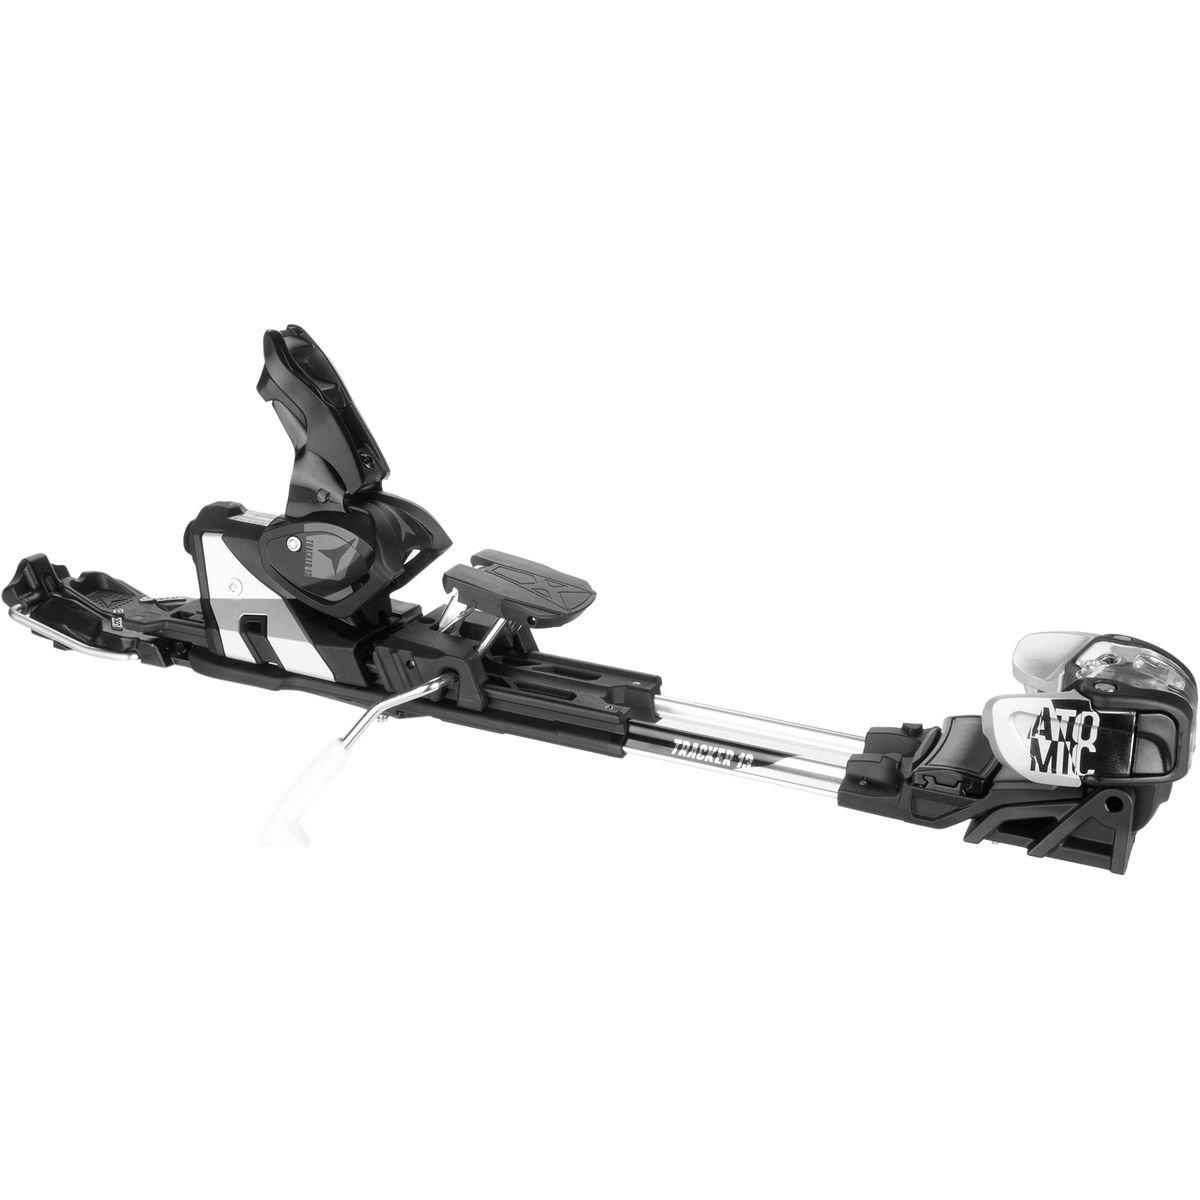 Atomic Tracker 13 MNC Alpine Touring Binding Black/Silver, 90mm/S